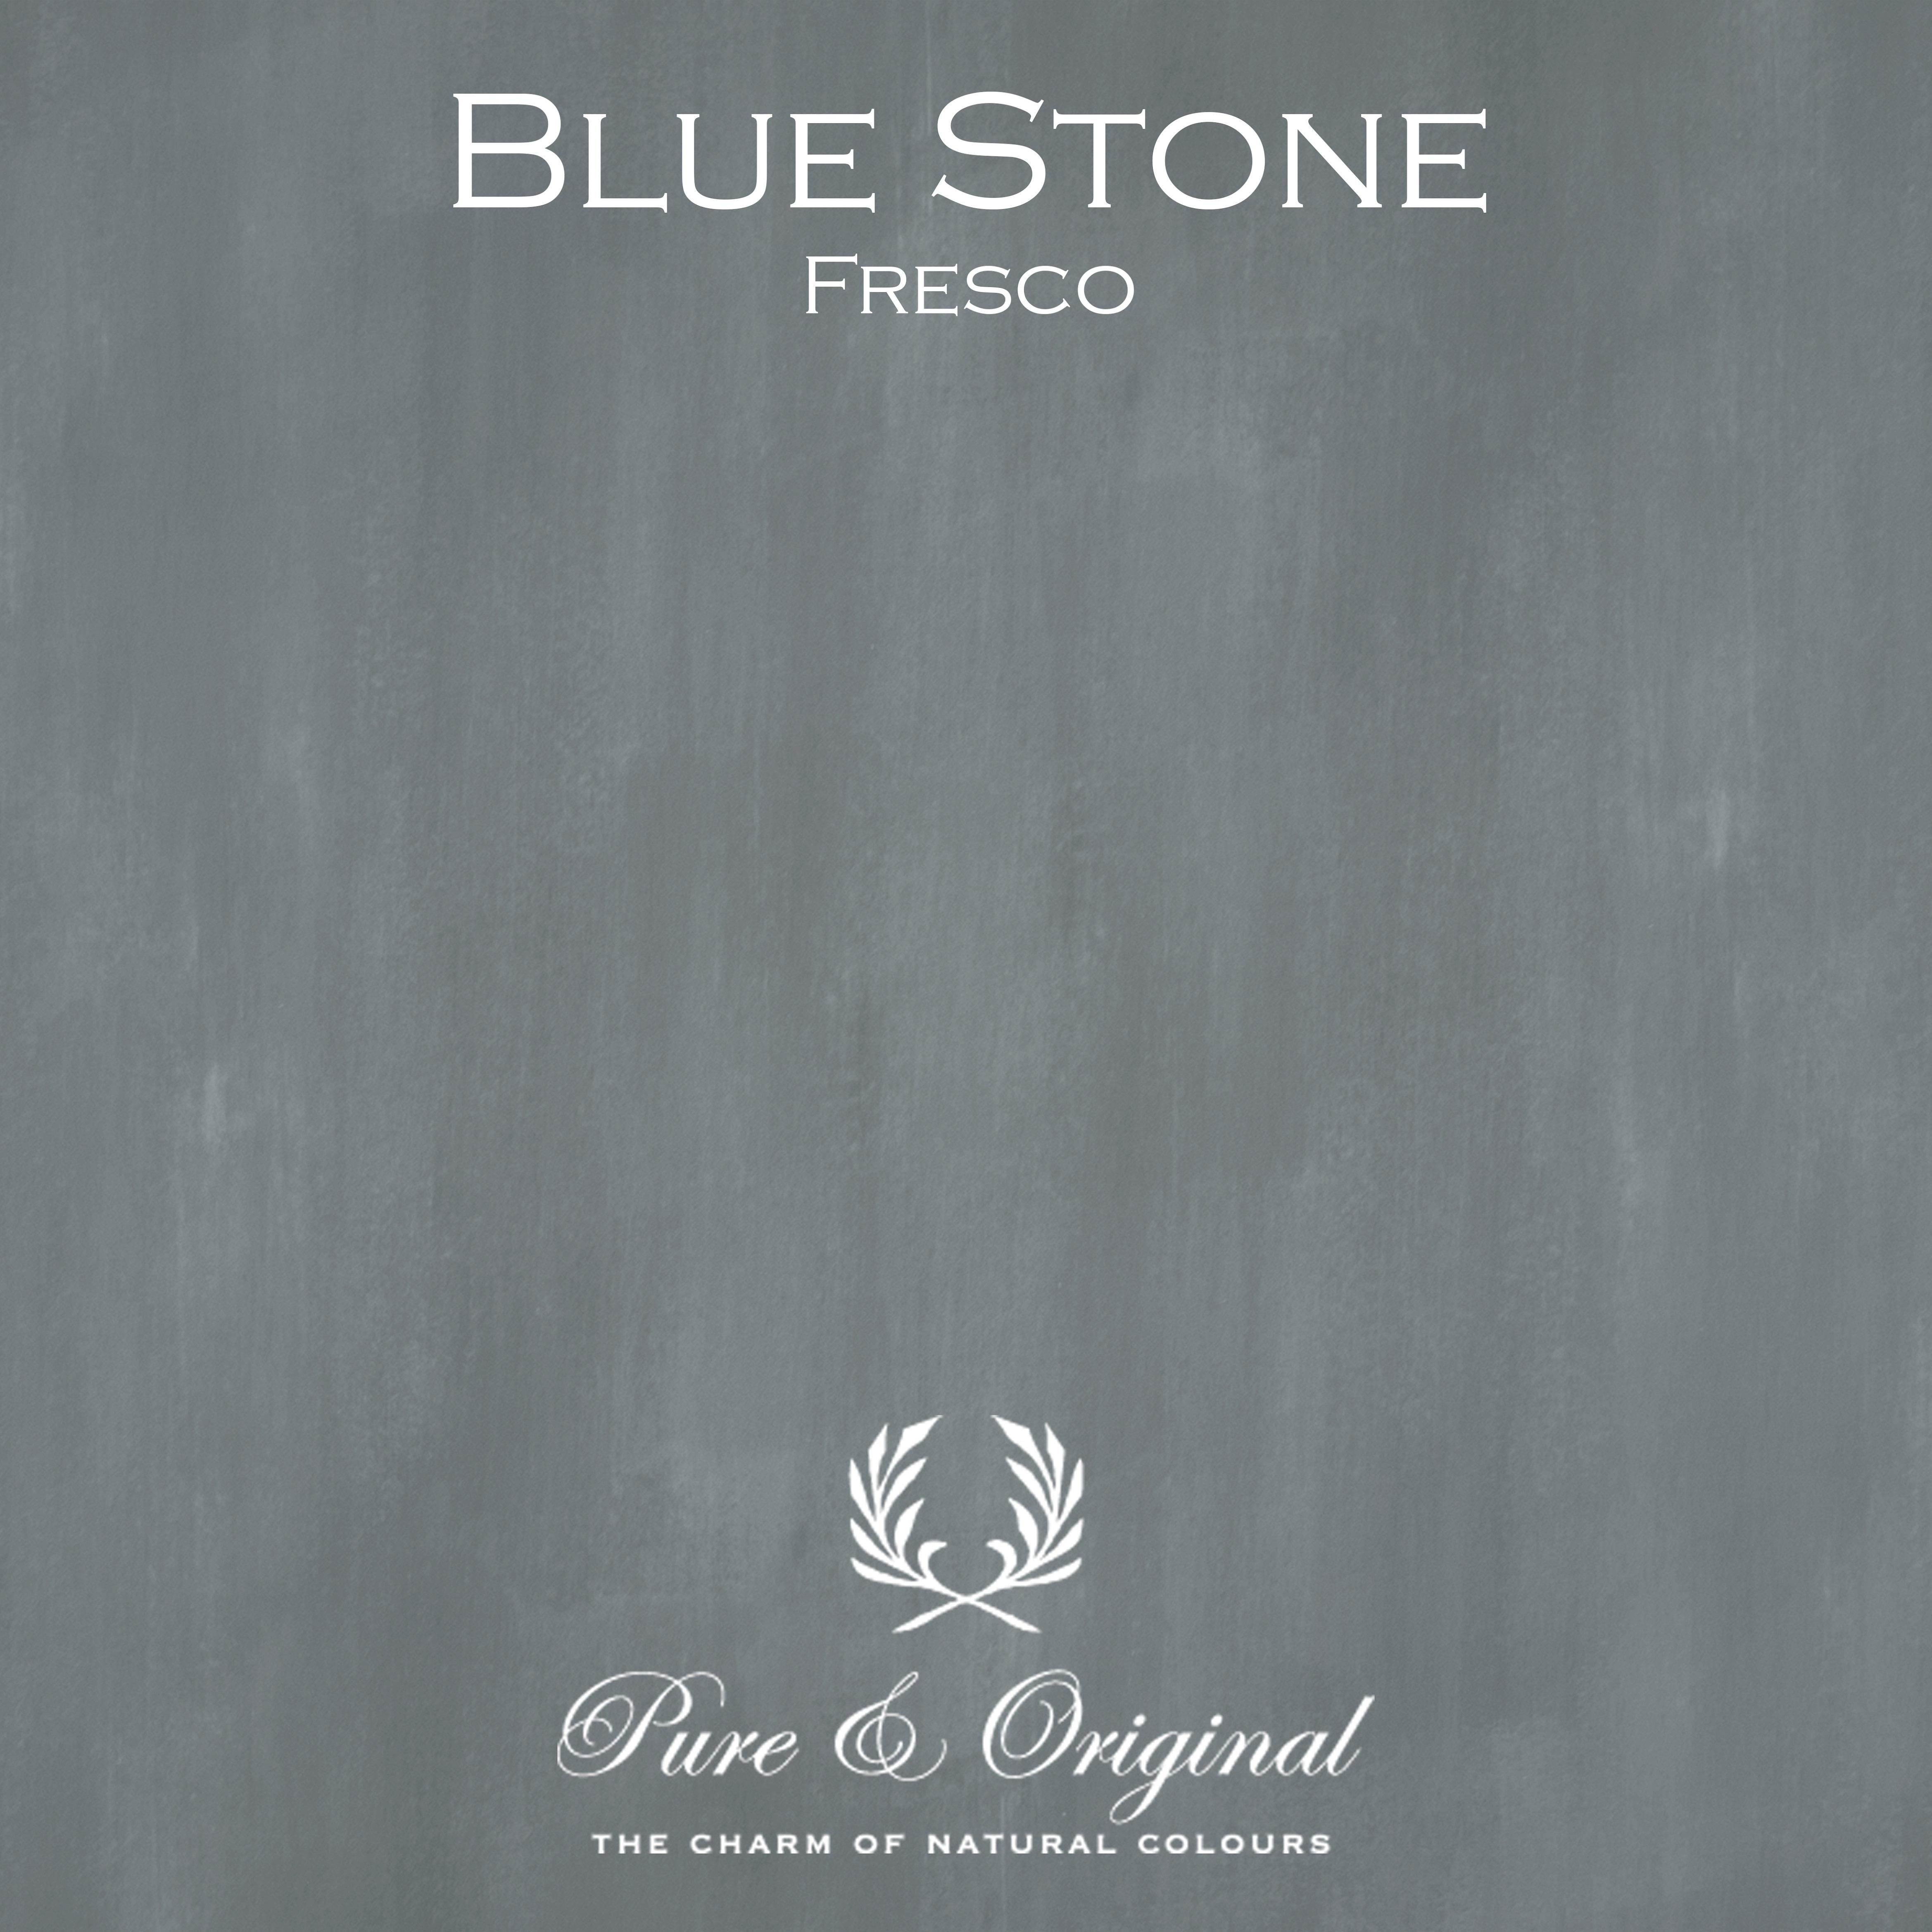 Kulör Blue Stone, Fresco kalkfärg